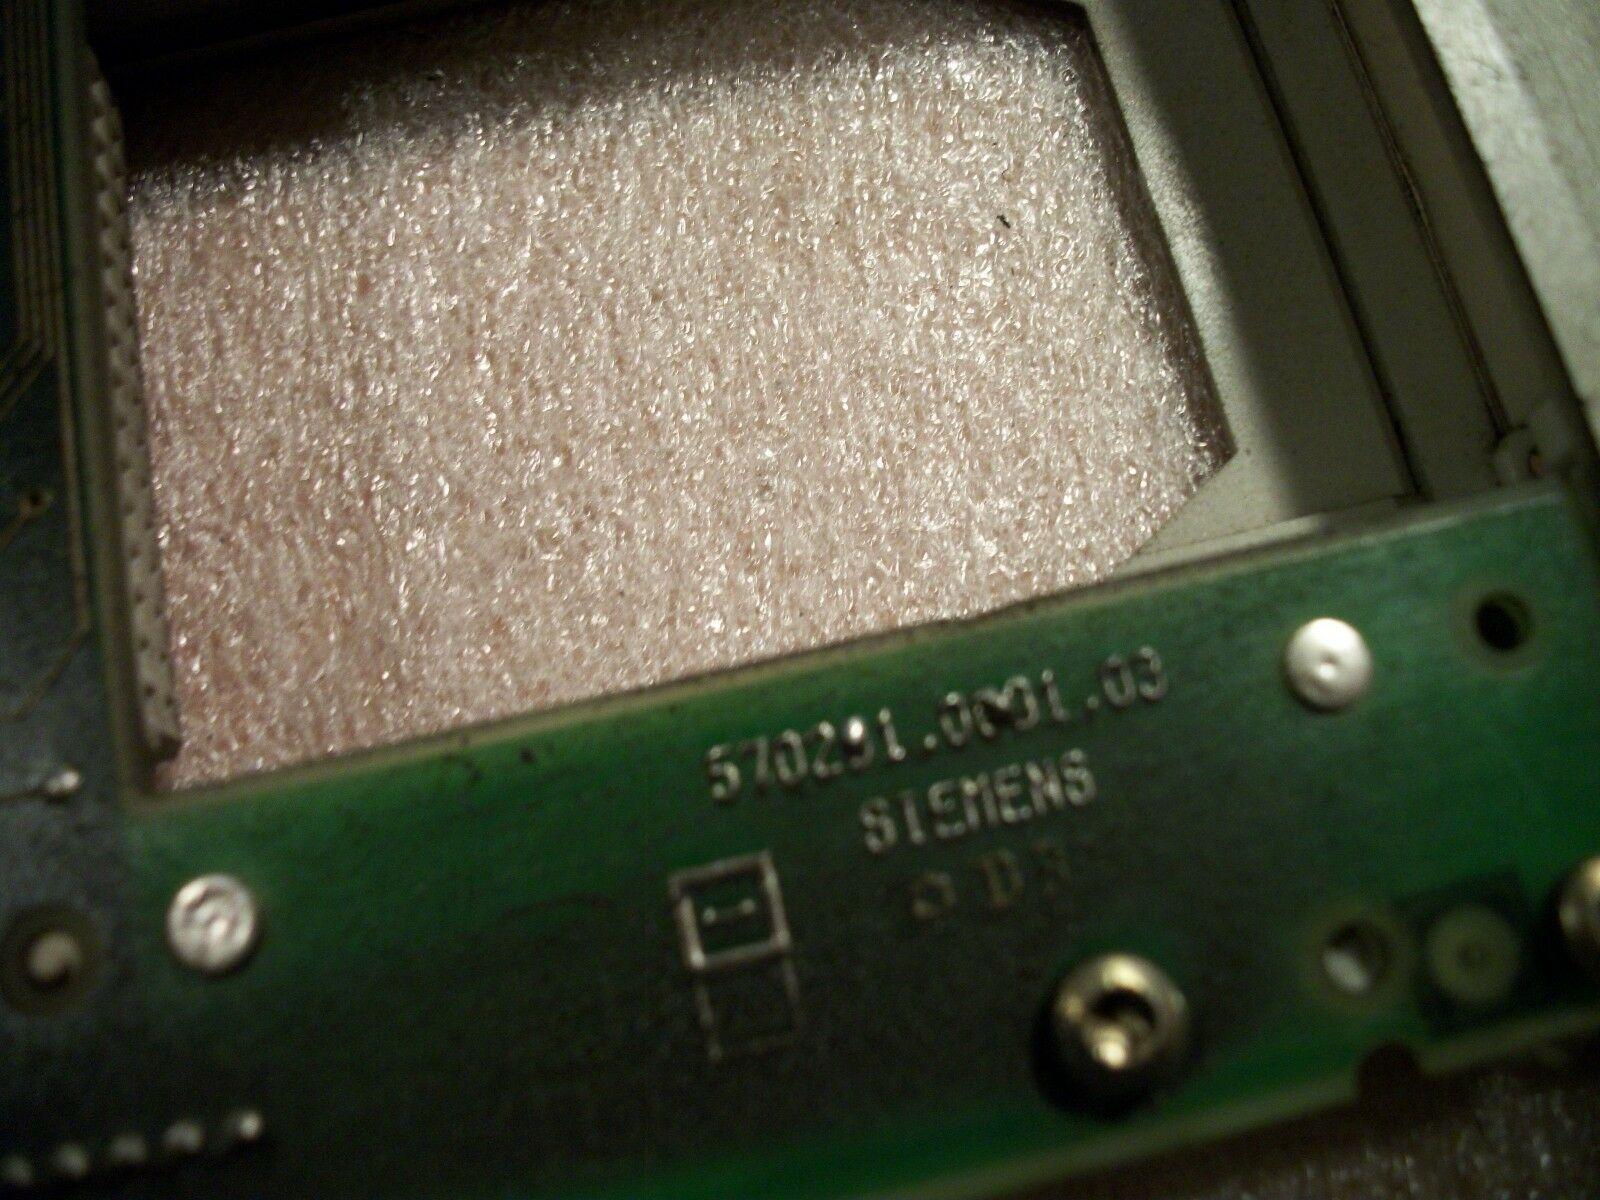 Siemens CNC Control Circuit Board 570 221 9002.03 / OE 570281.0001.03